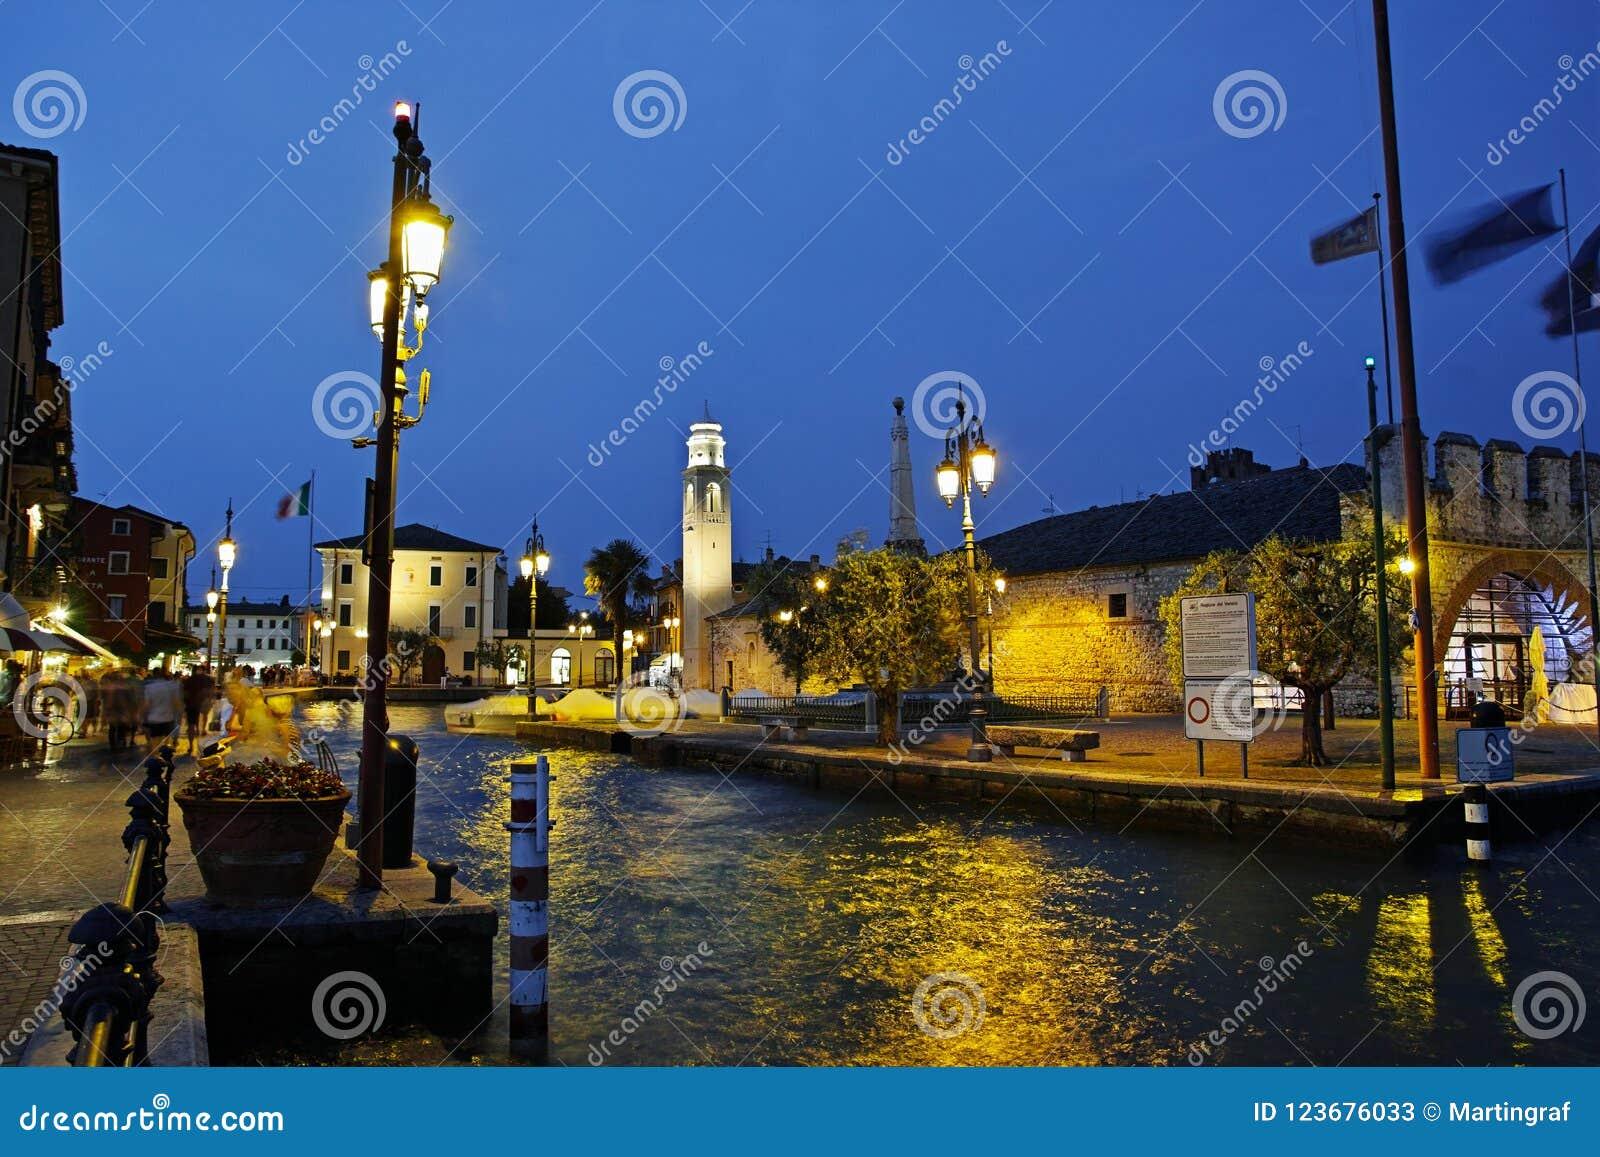 Сцена вечера лета на порте среднеземноморского города